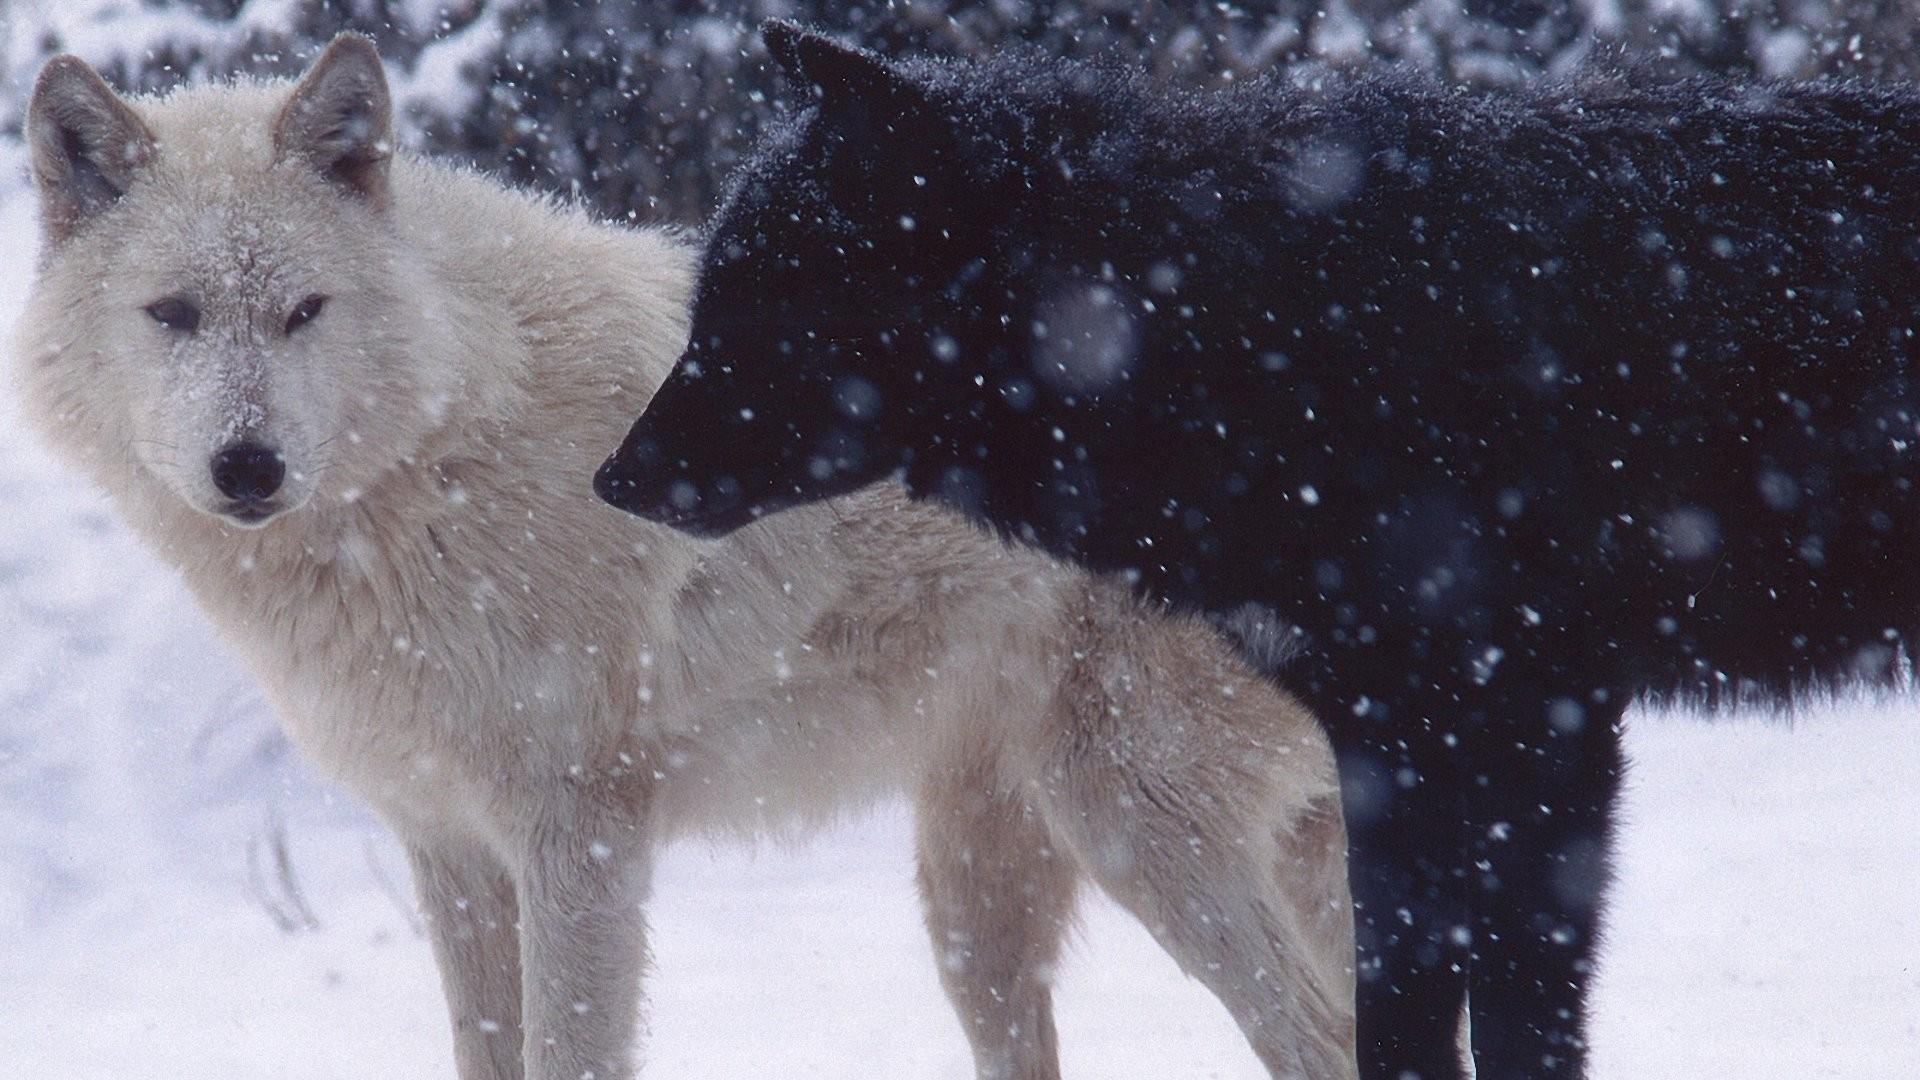 … Background Full HD 1080p. Wallpaper wolves, pair, predator,  snow, dogs